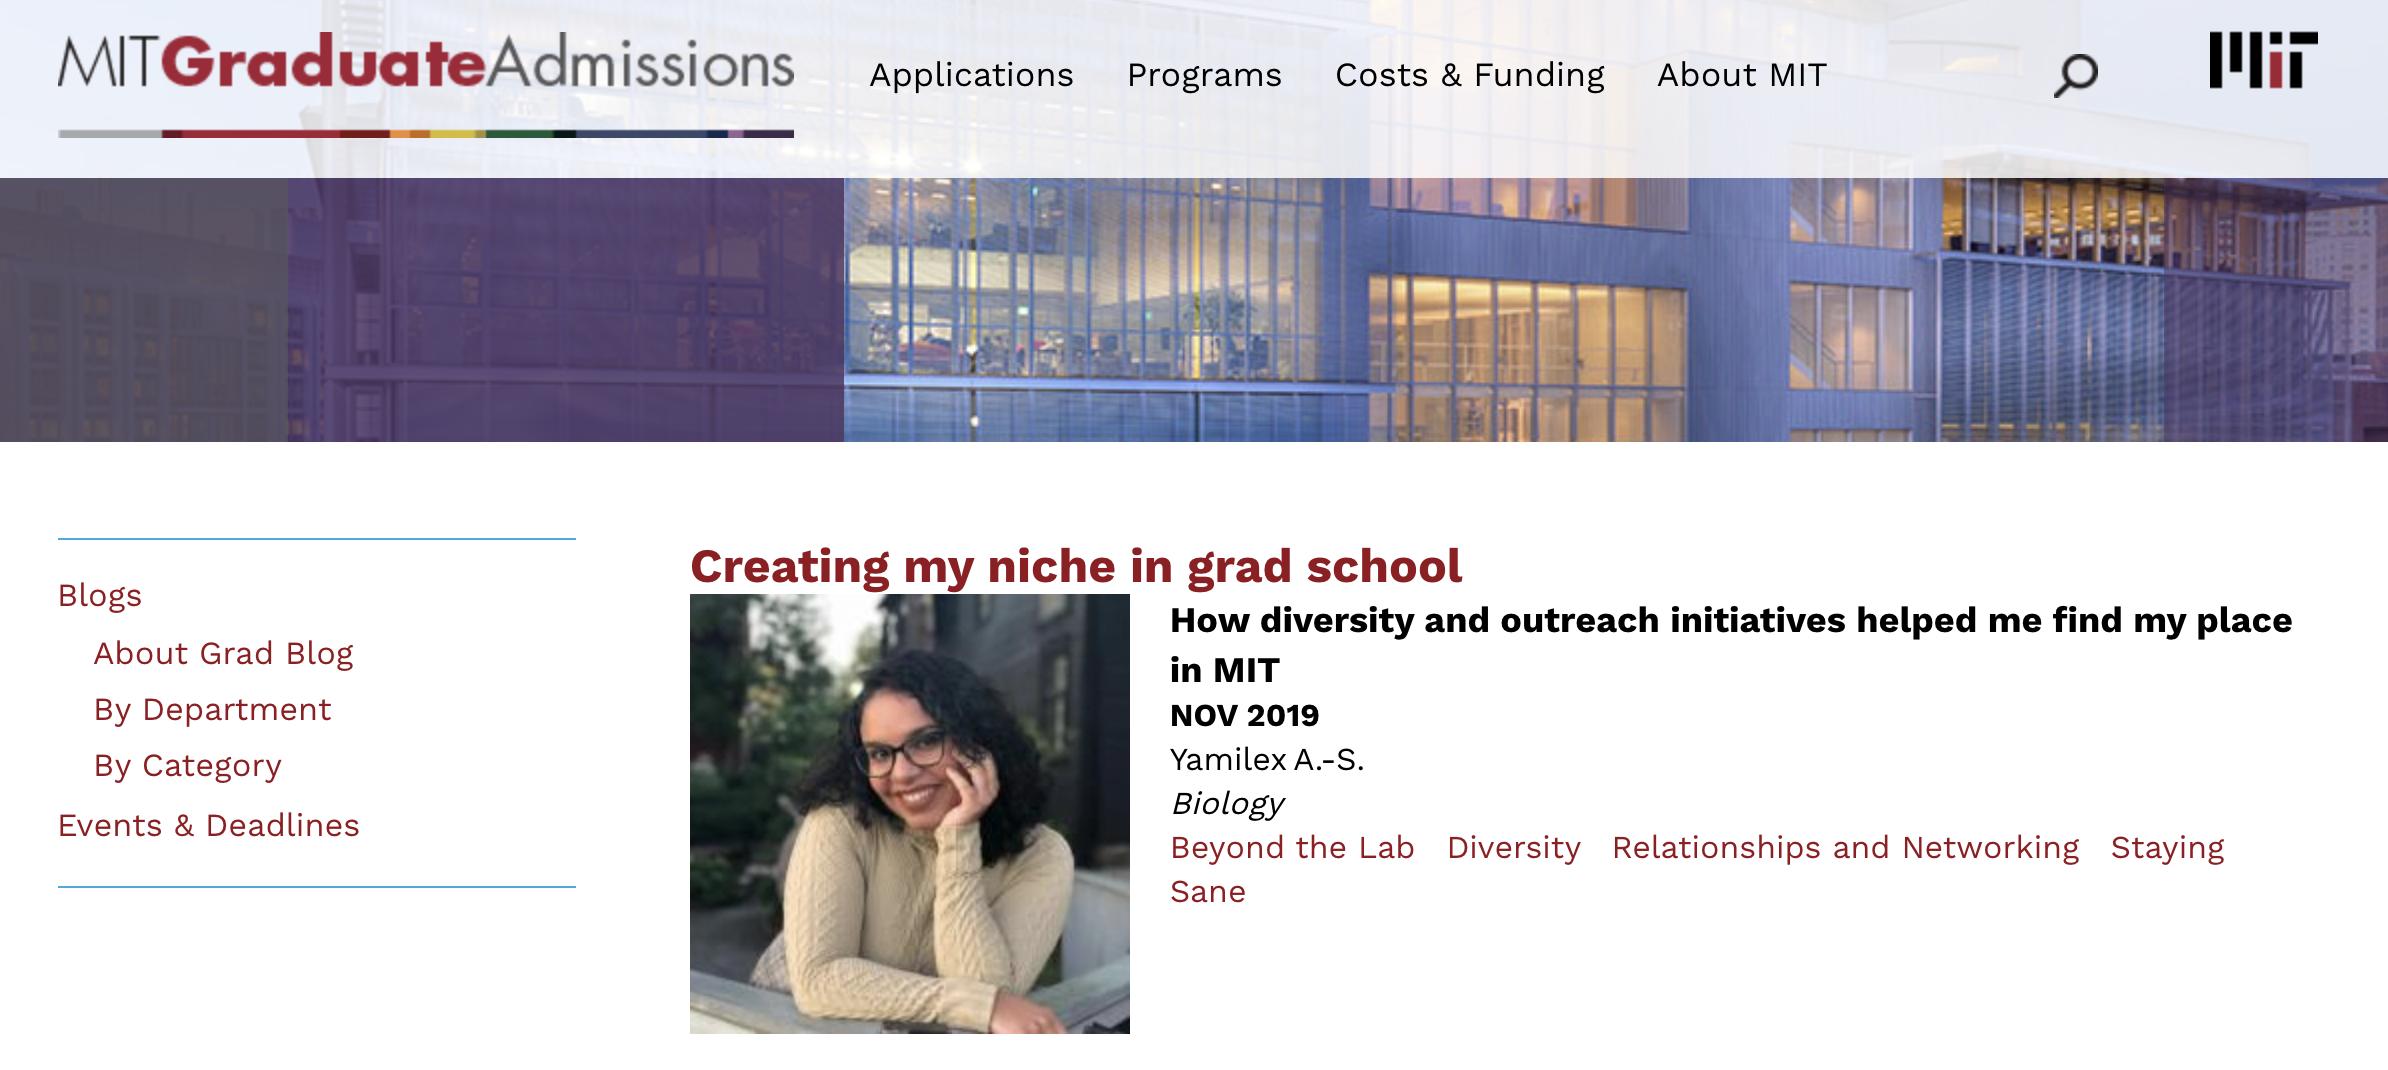 Creating my niche in grad school